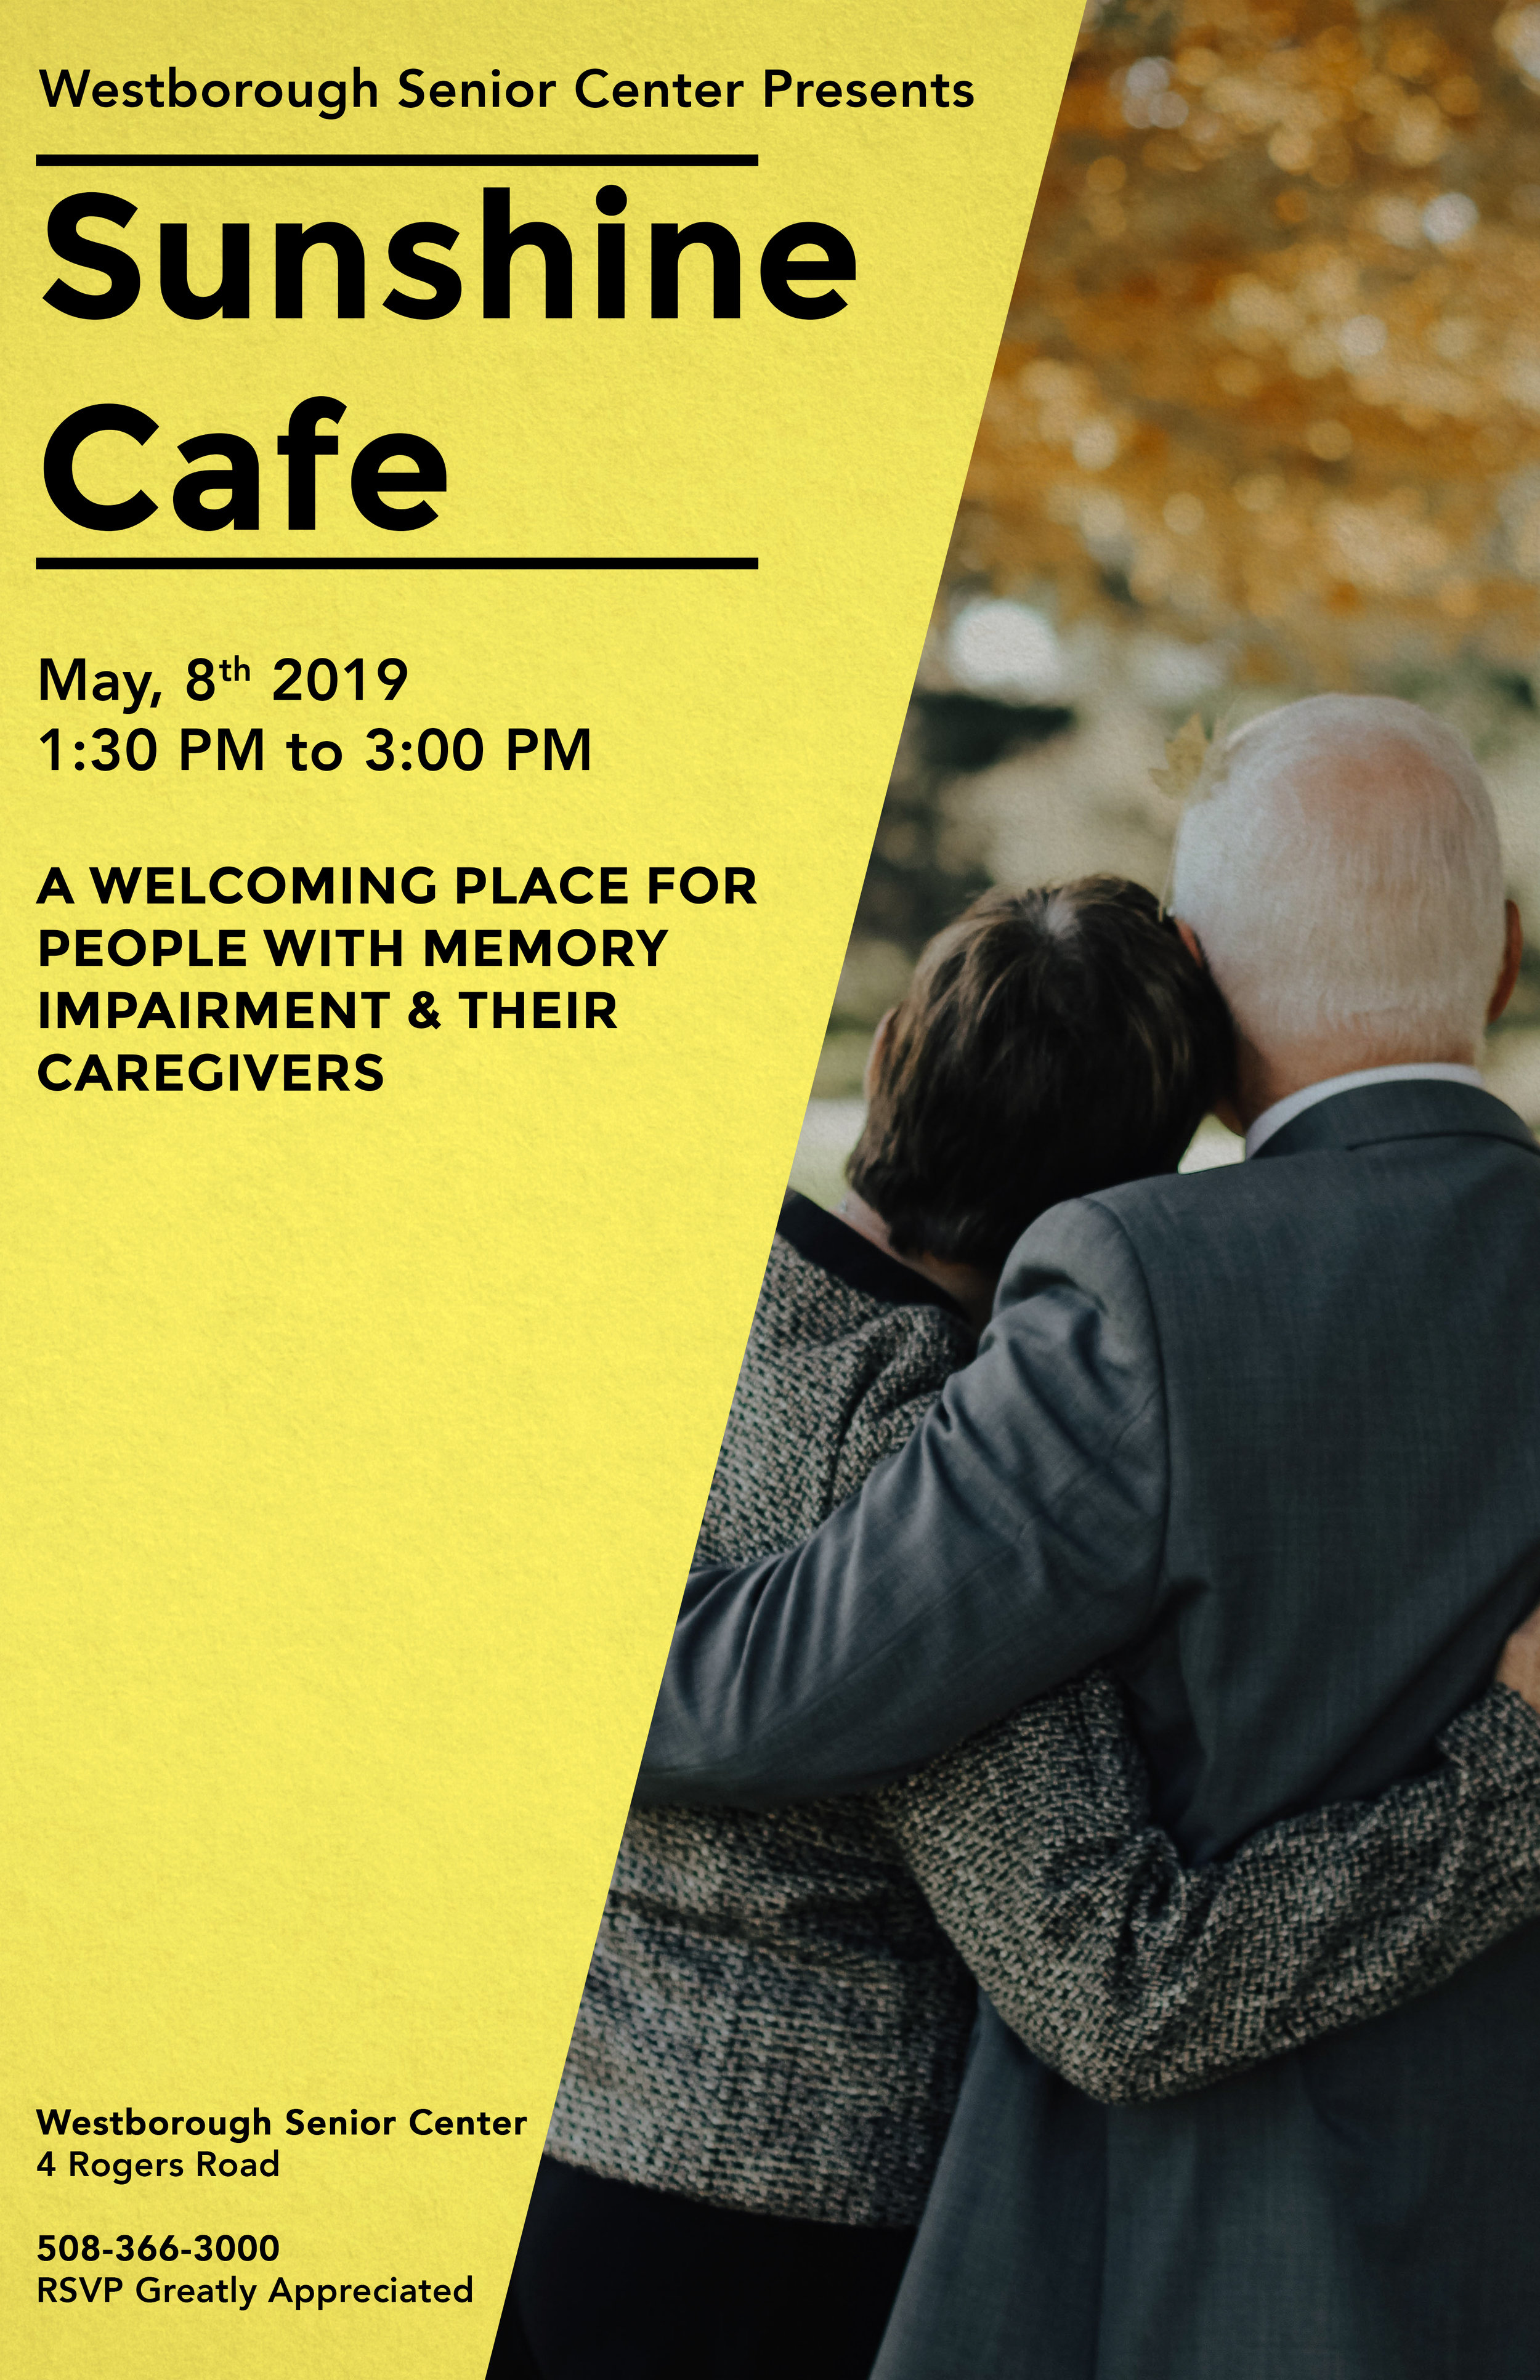 Sunshine-Cafe_May-2019.jpg